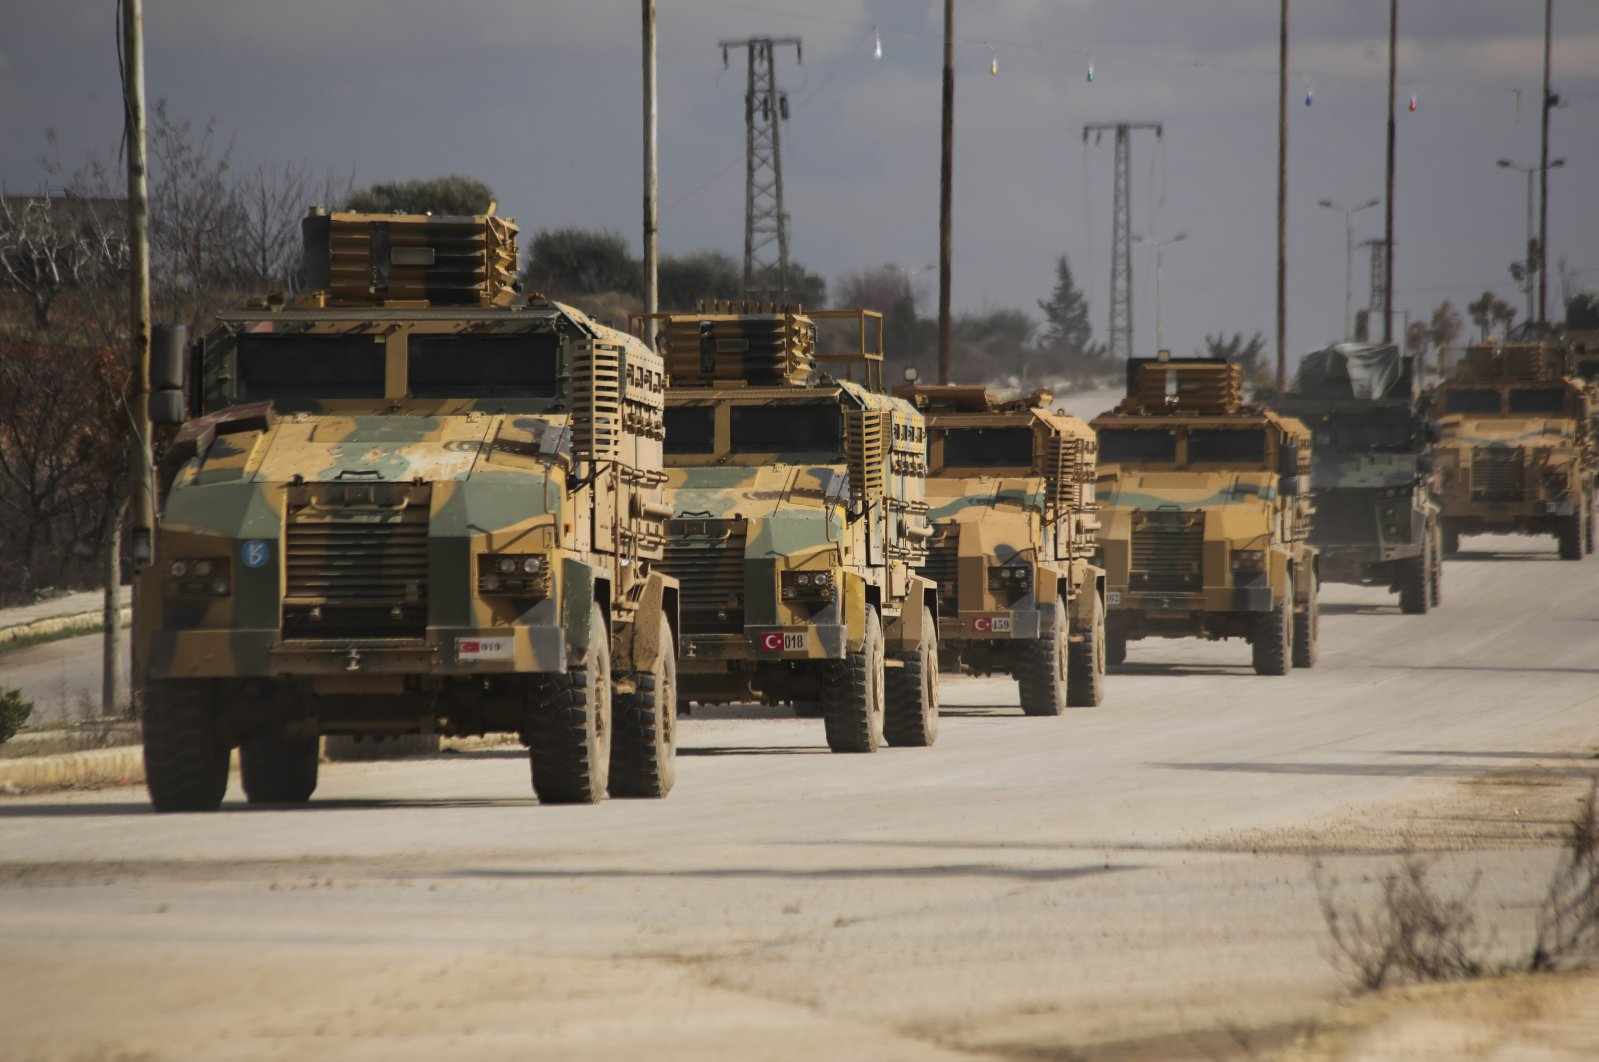 A Turkish military convoy drives in Idlib province, Syria, Feb. 22, 2020. (AP Photo)